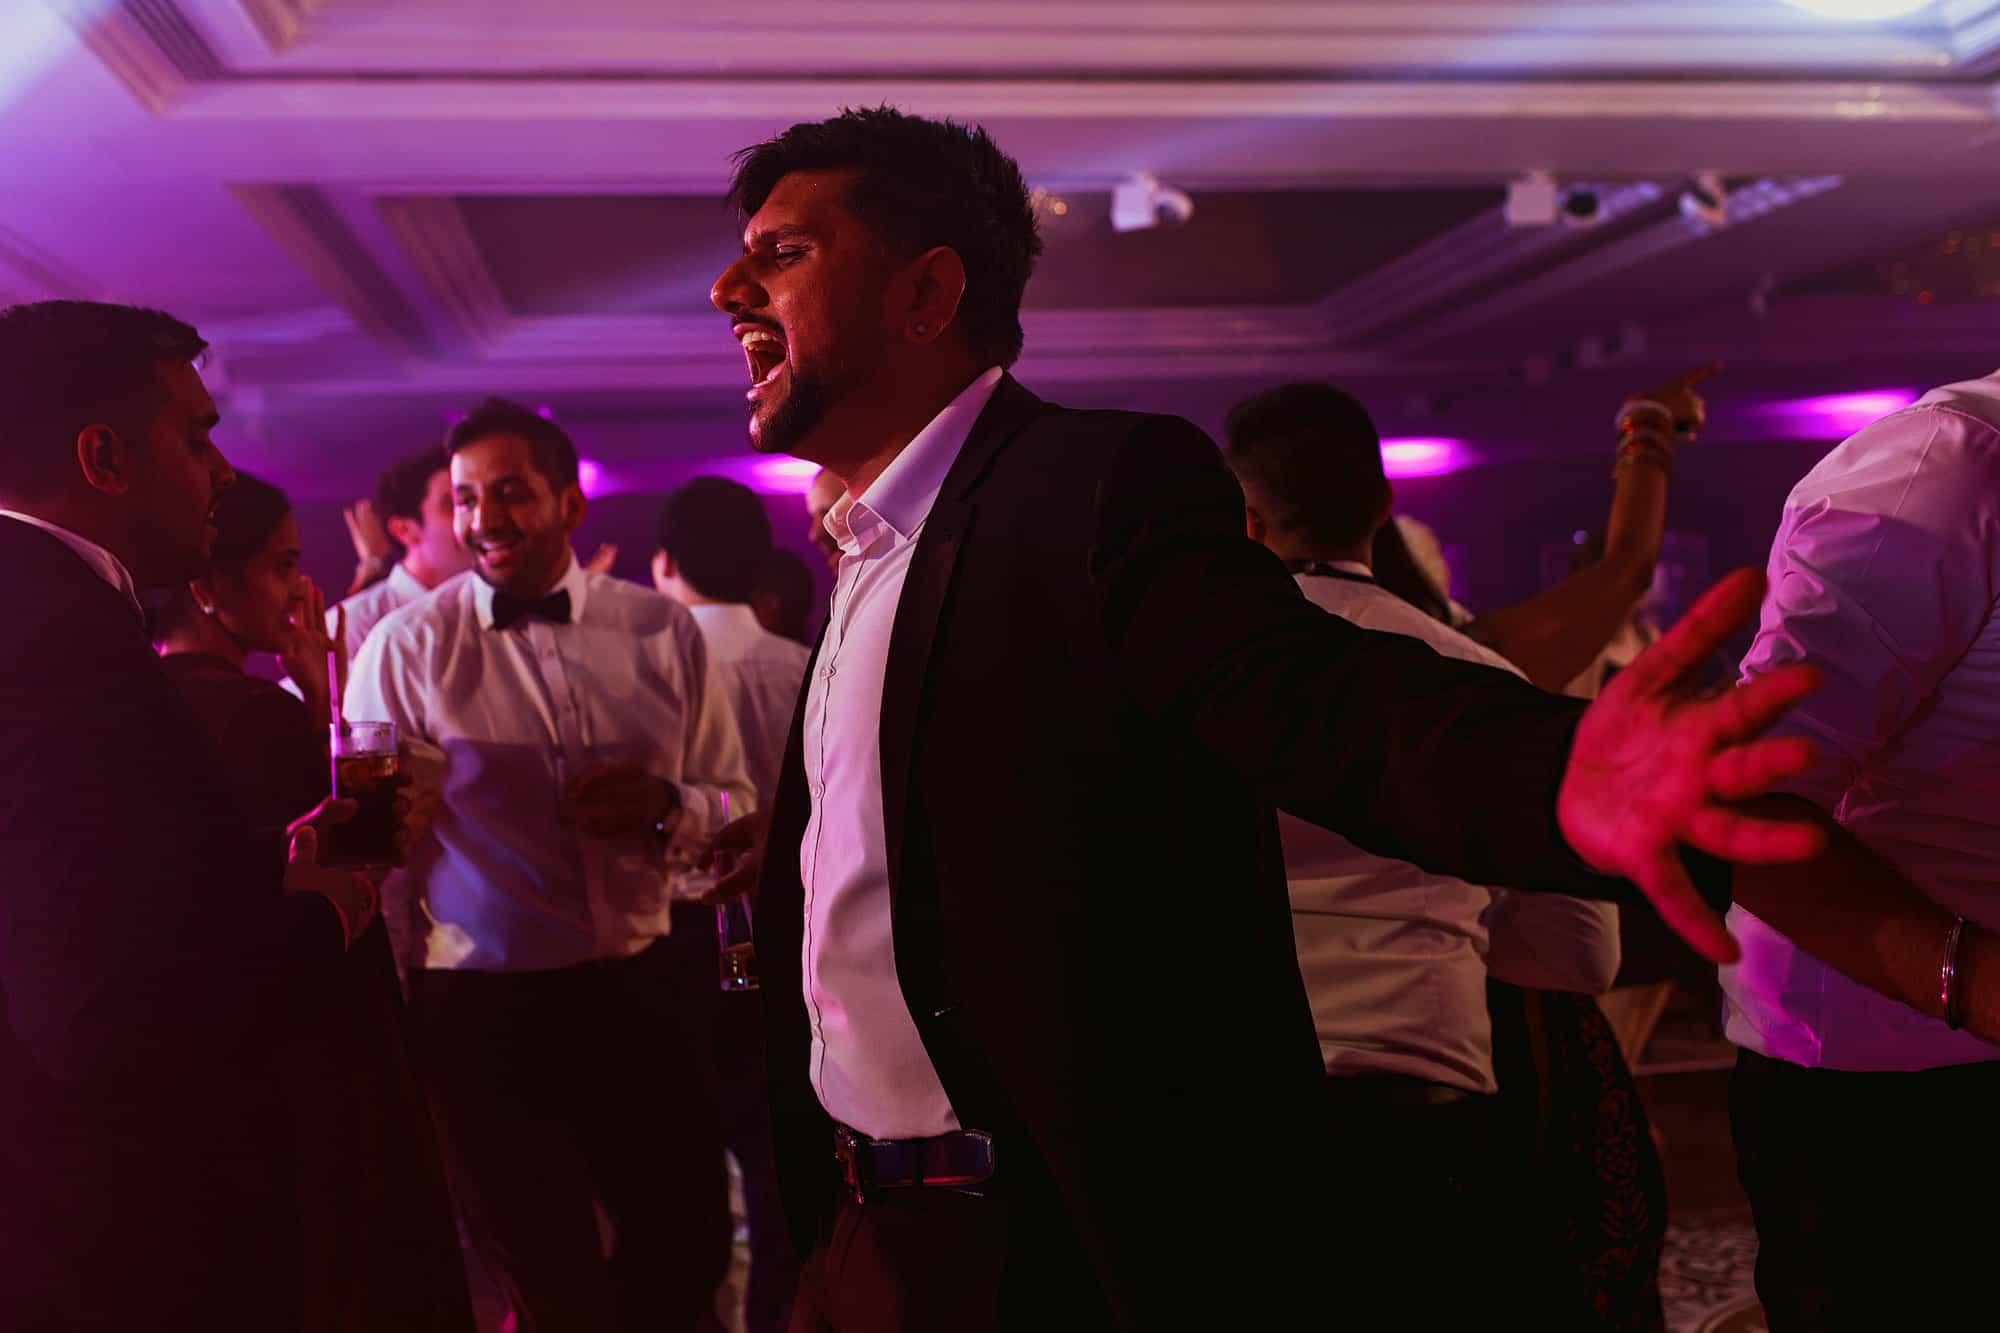 jumeirah carlton wedding hindu reception 1